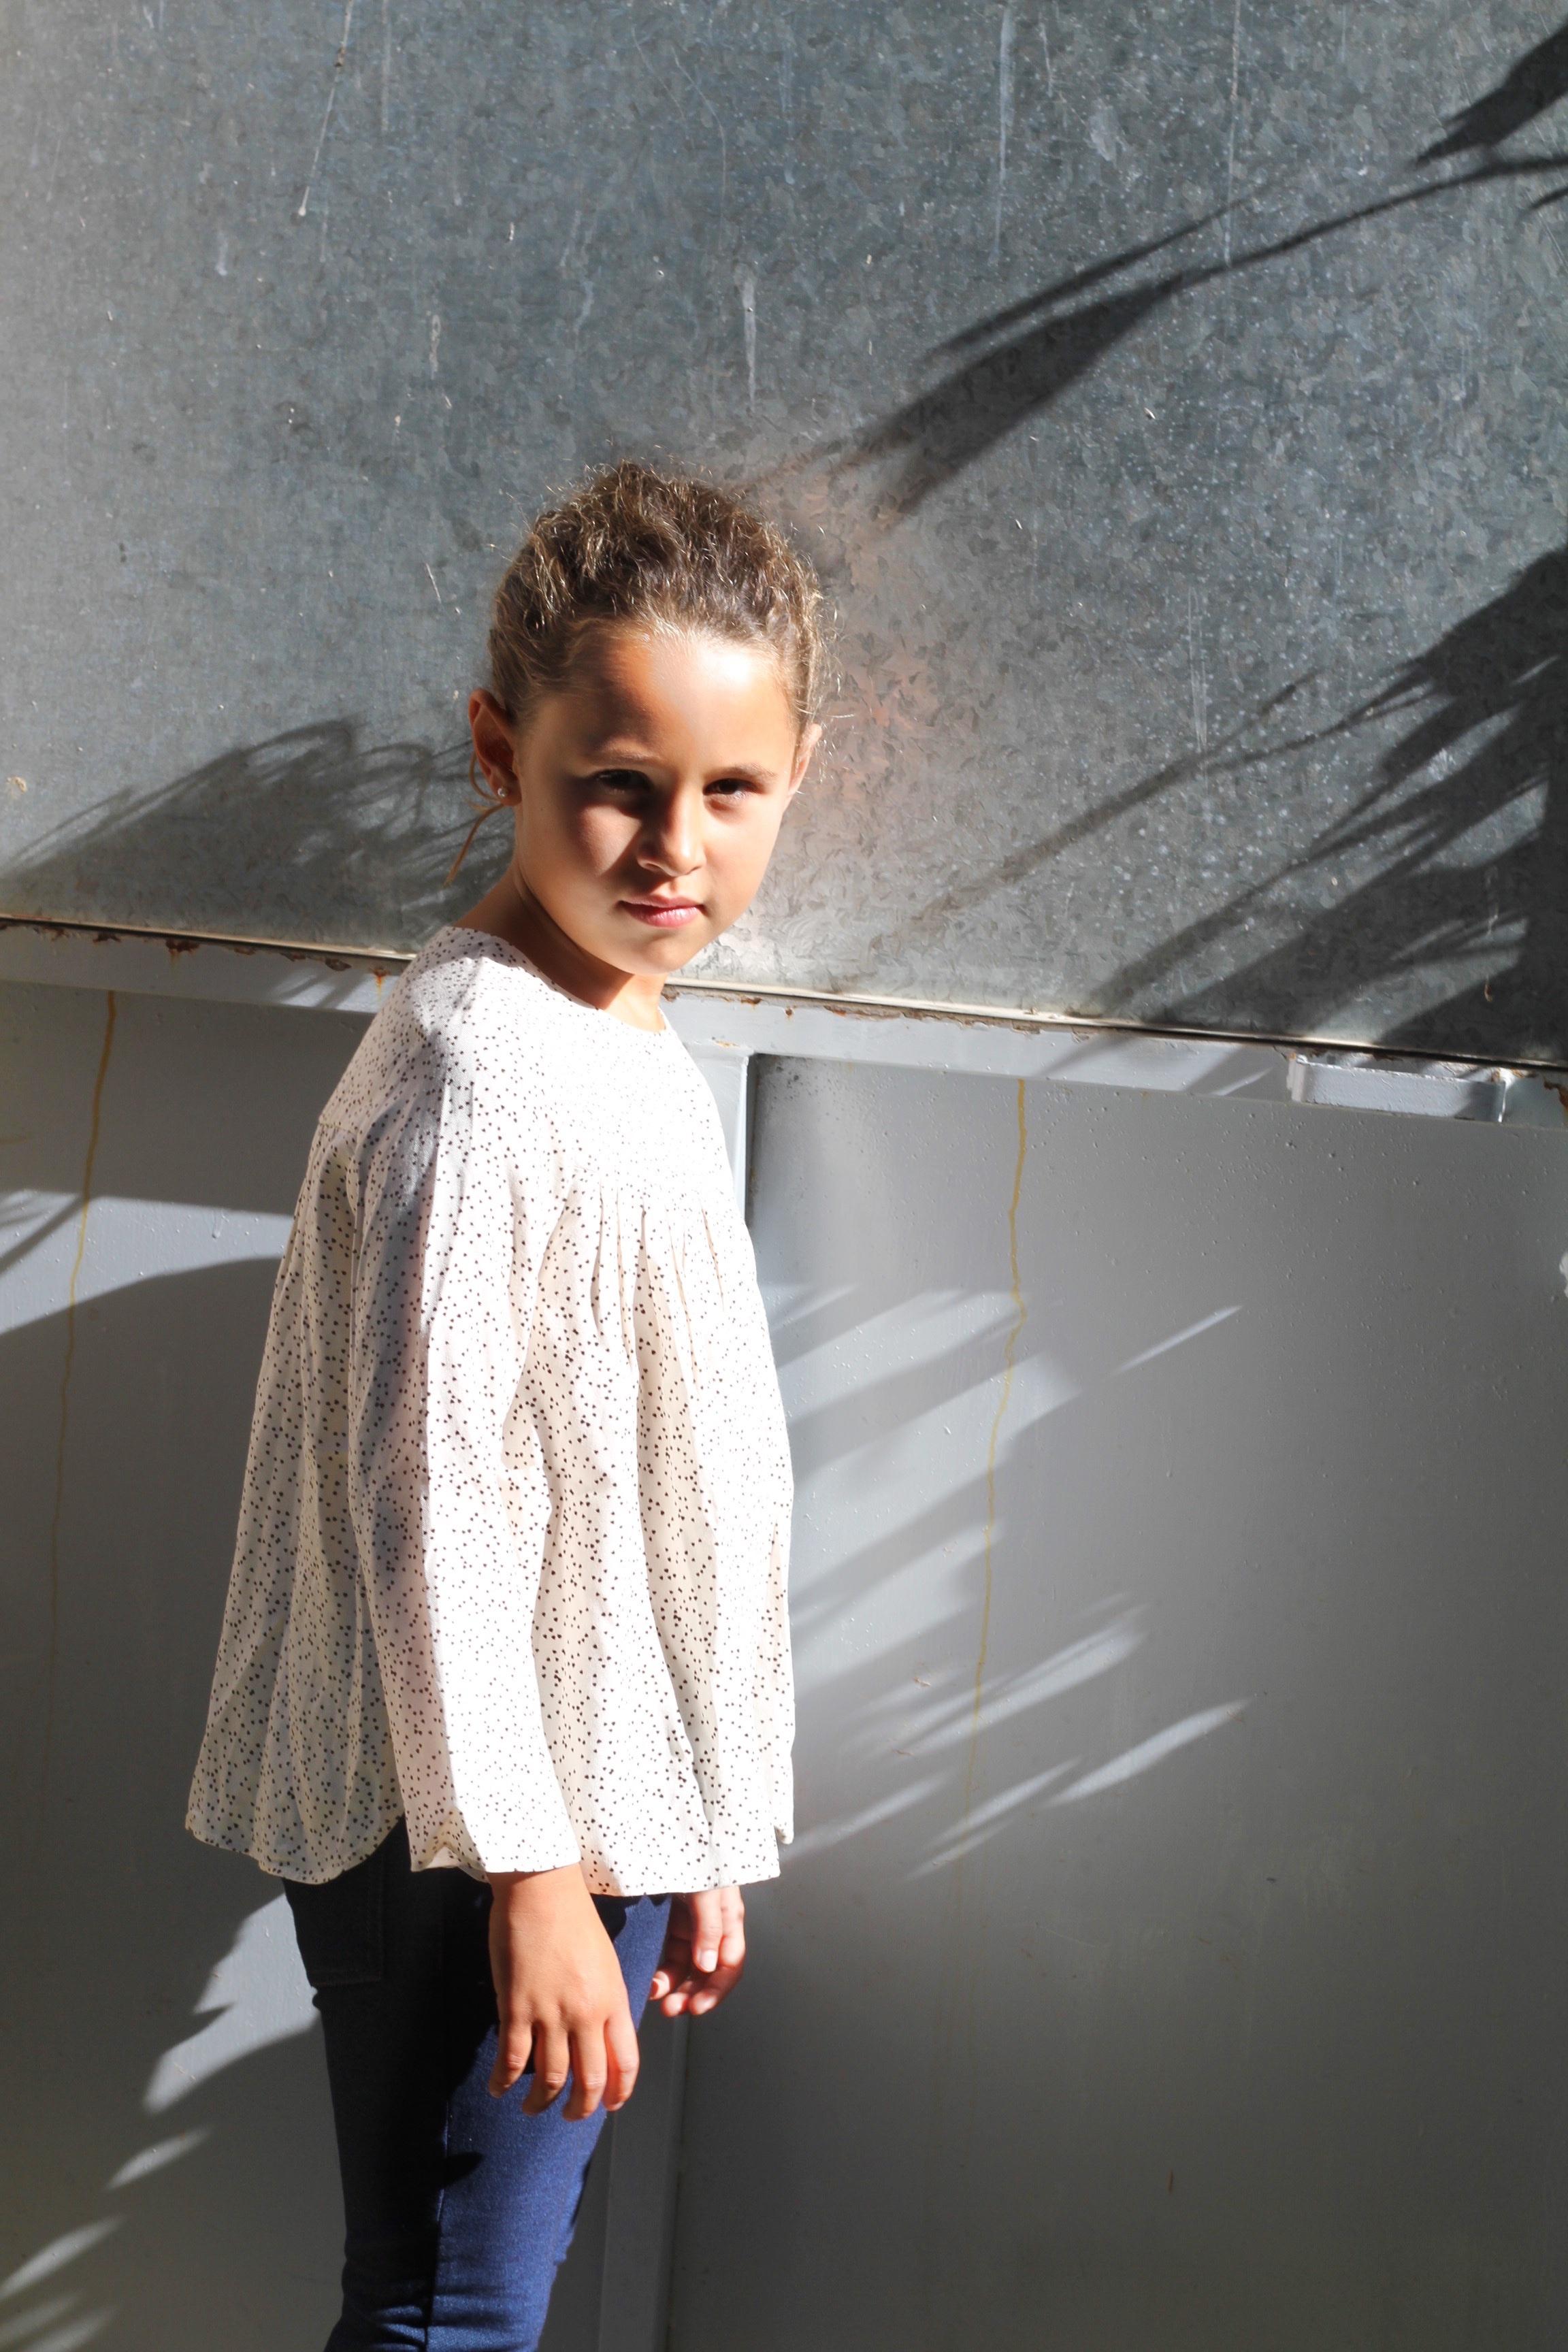 alpargatas de pelo-zara-fashion-style-descalzaporelparque-niños-blog-zara kids-kids-jimena